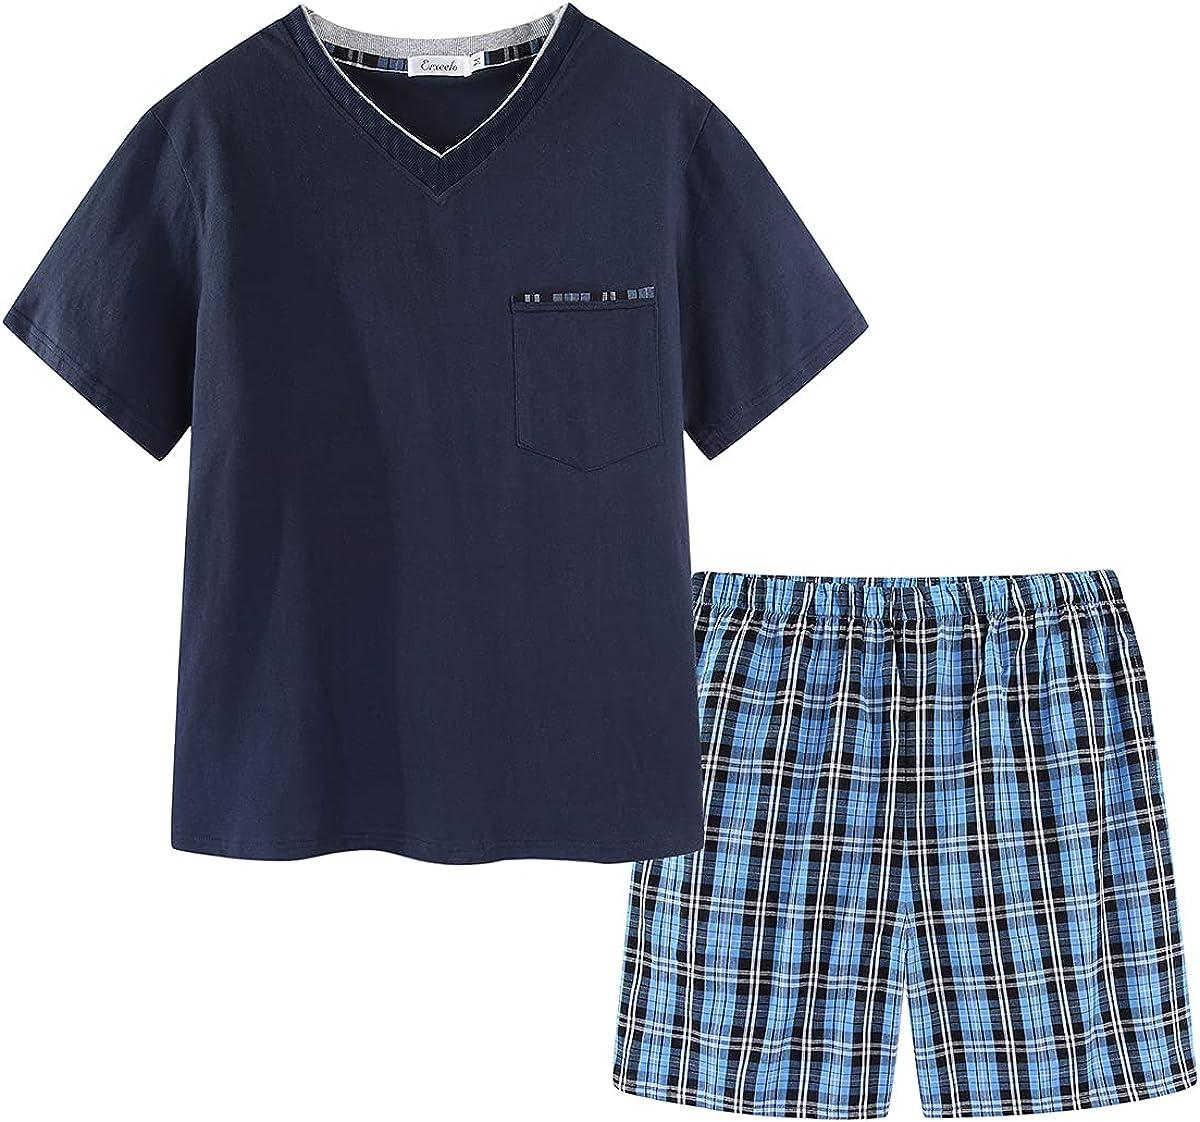 CHUNG Men's Short Sleeve T-shirt Tartan Boxer Shorts Bottom Set Cotton V-neck Pajamas Pjs Lounge Sleepwear Wear Summer